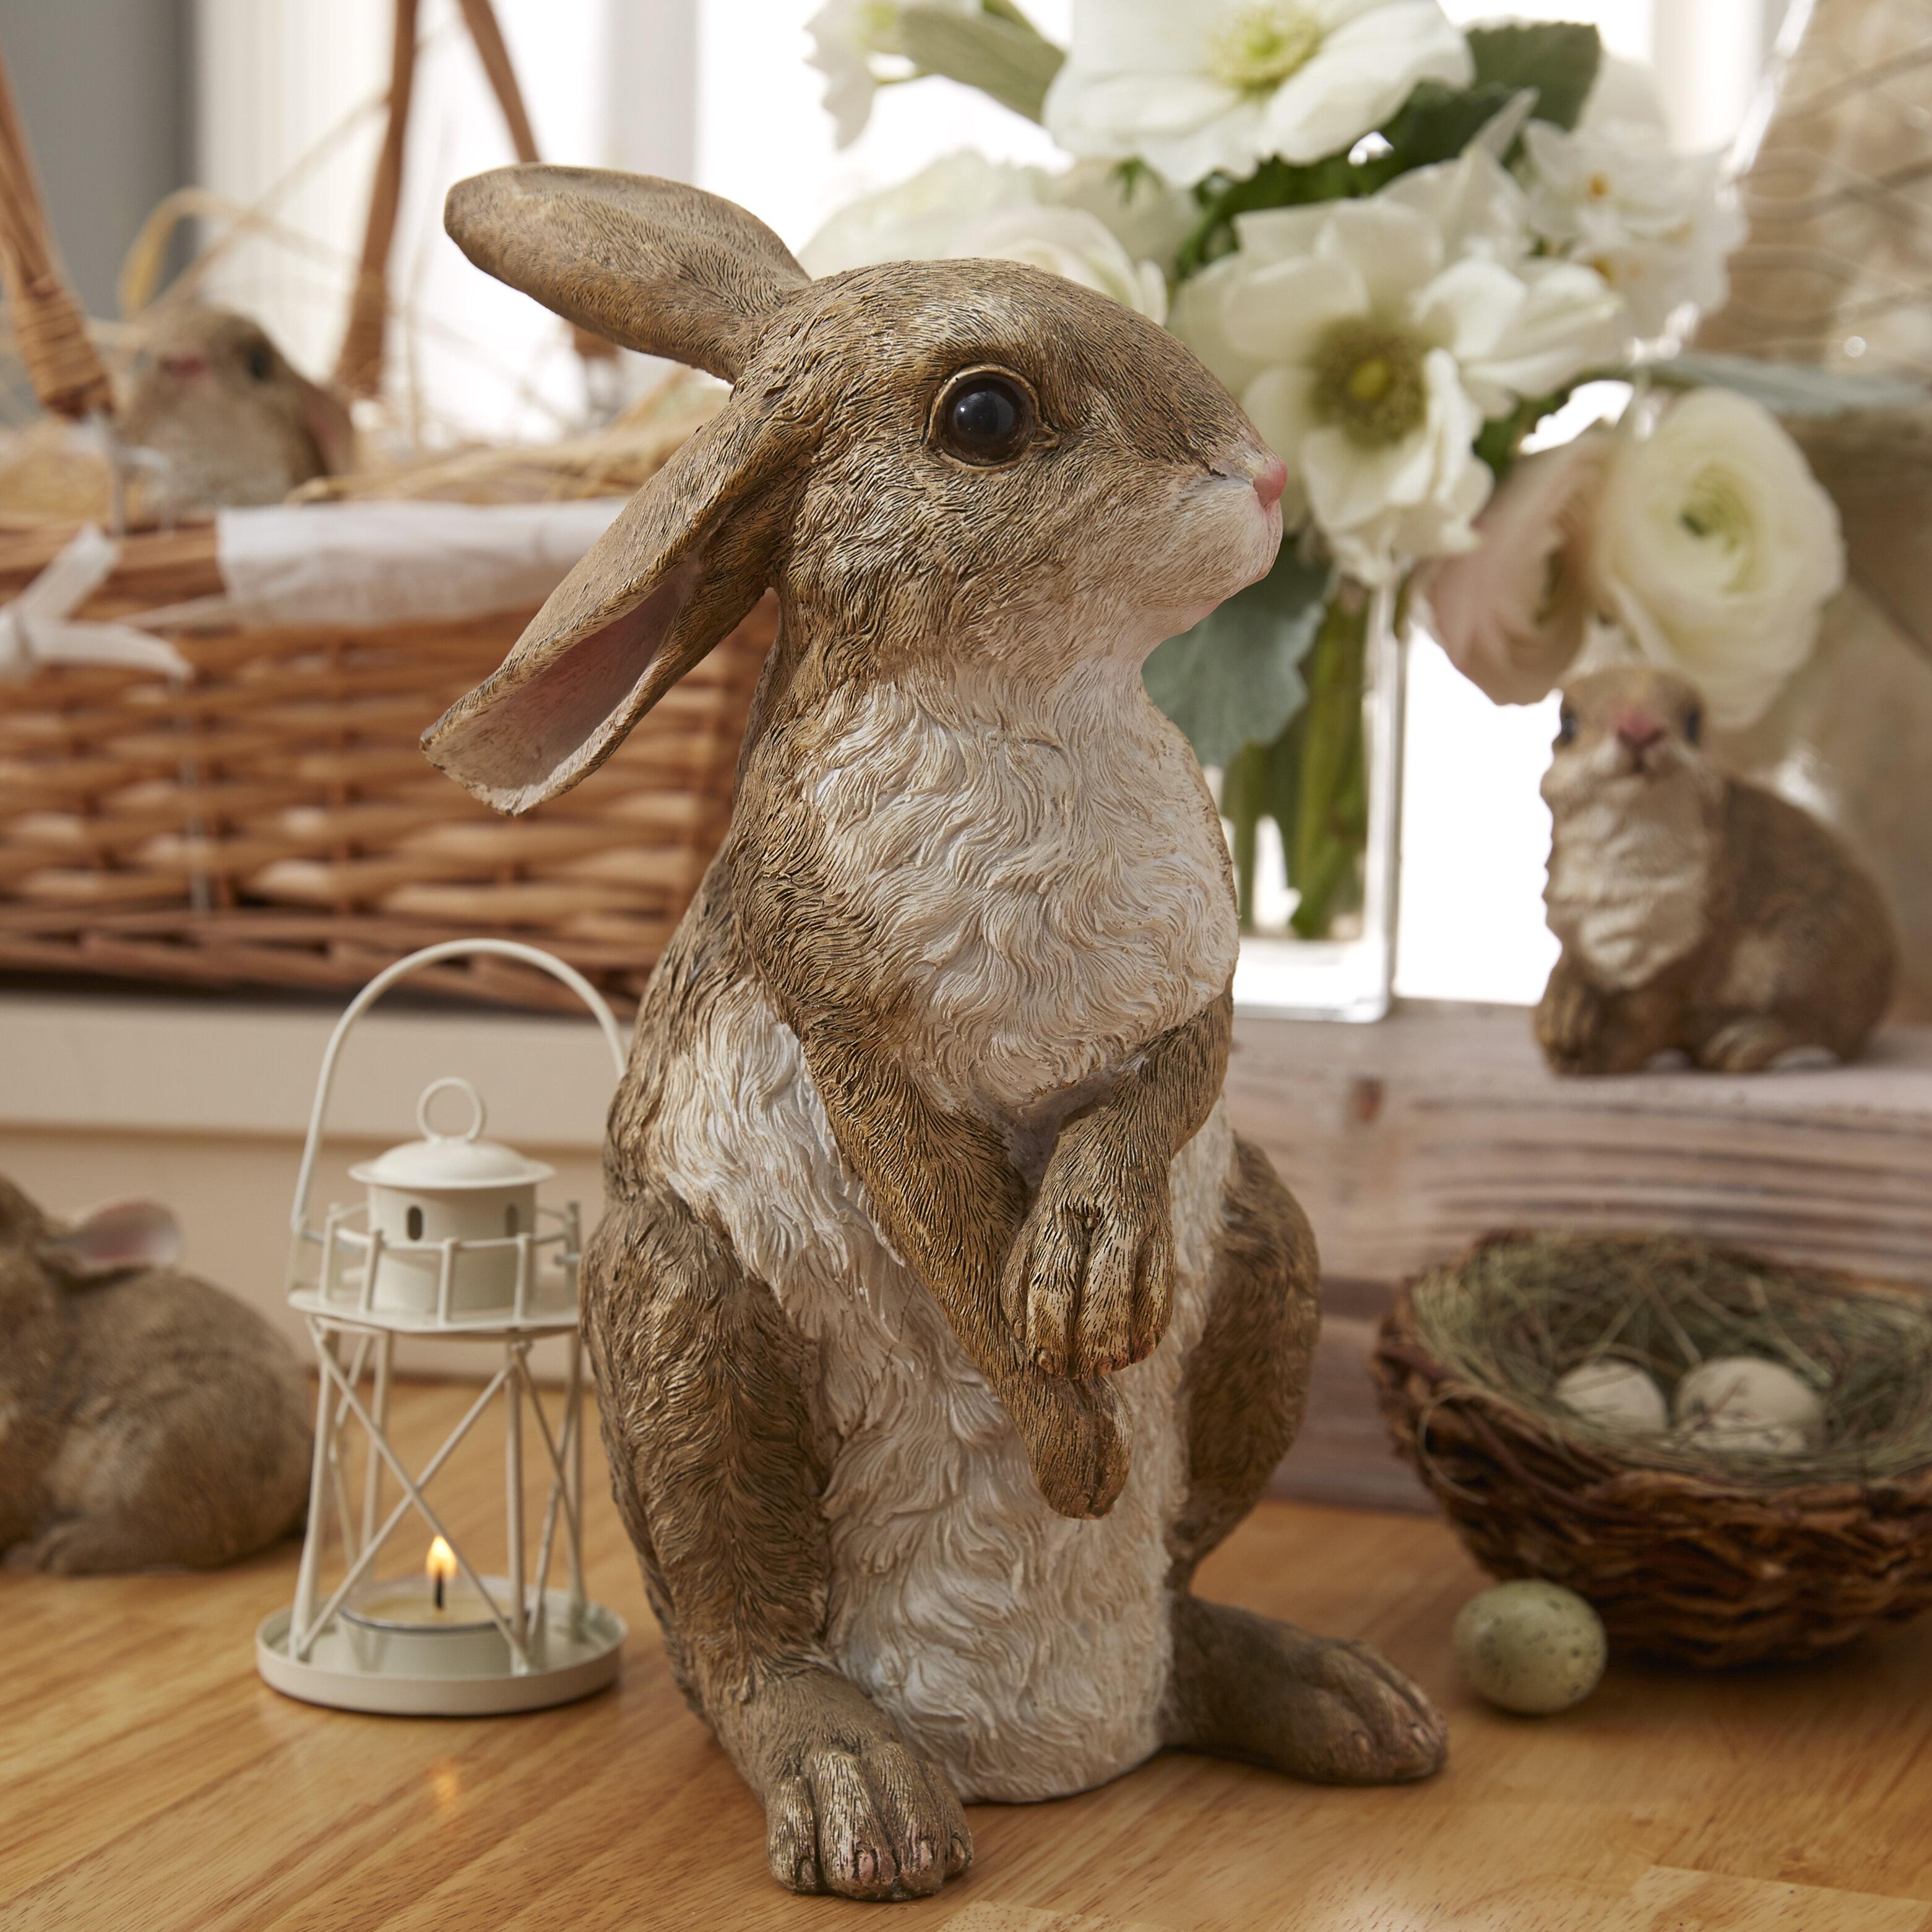 Design Toscano Hopper, the Bunny, Standing Garden Rabbit Statue ...